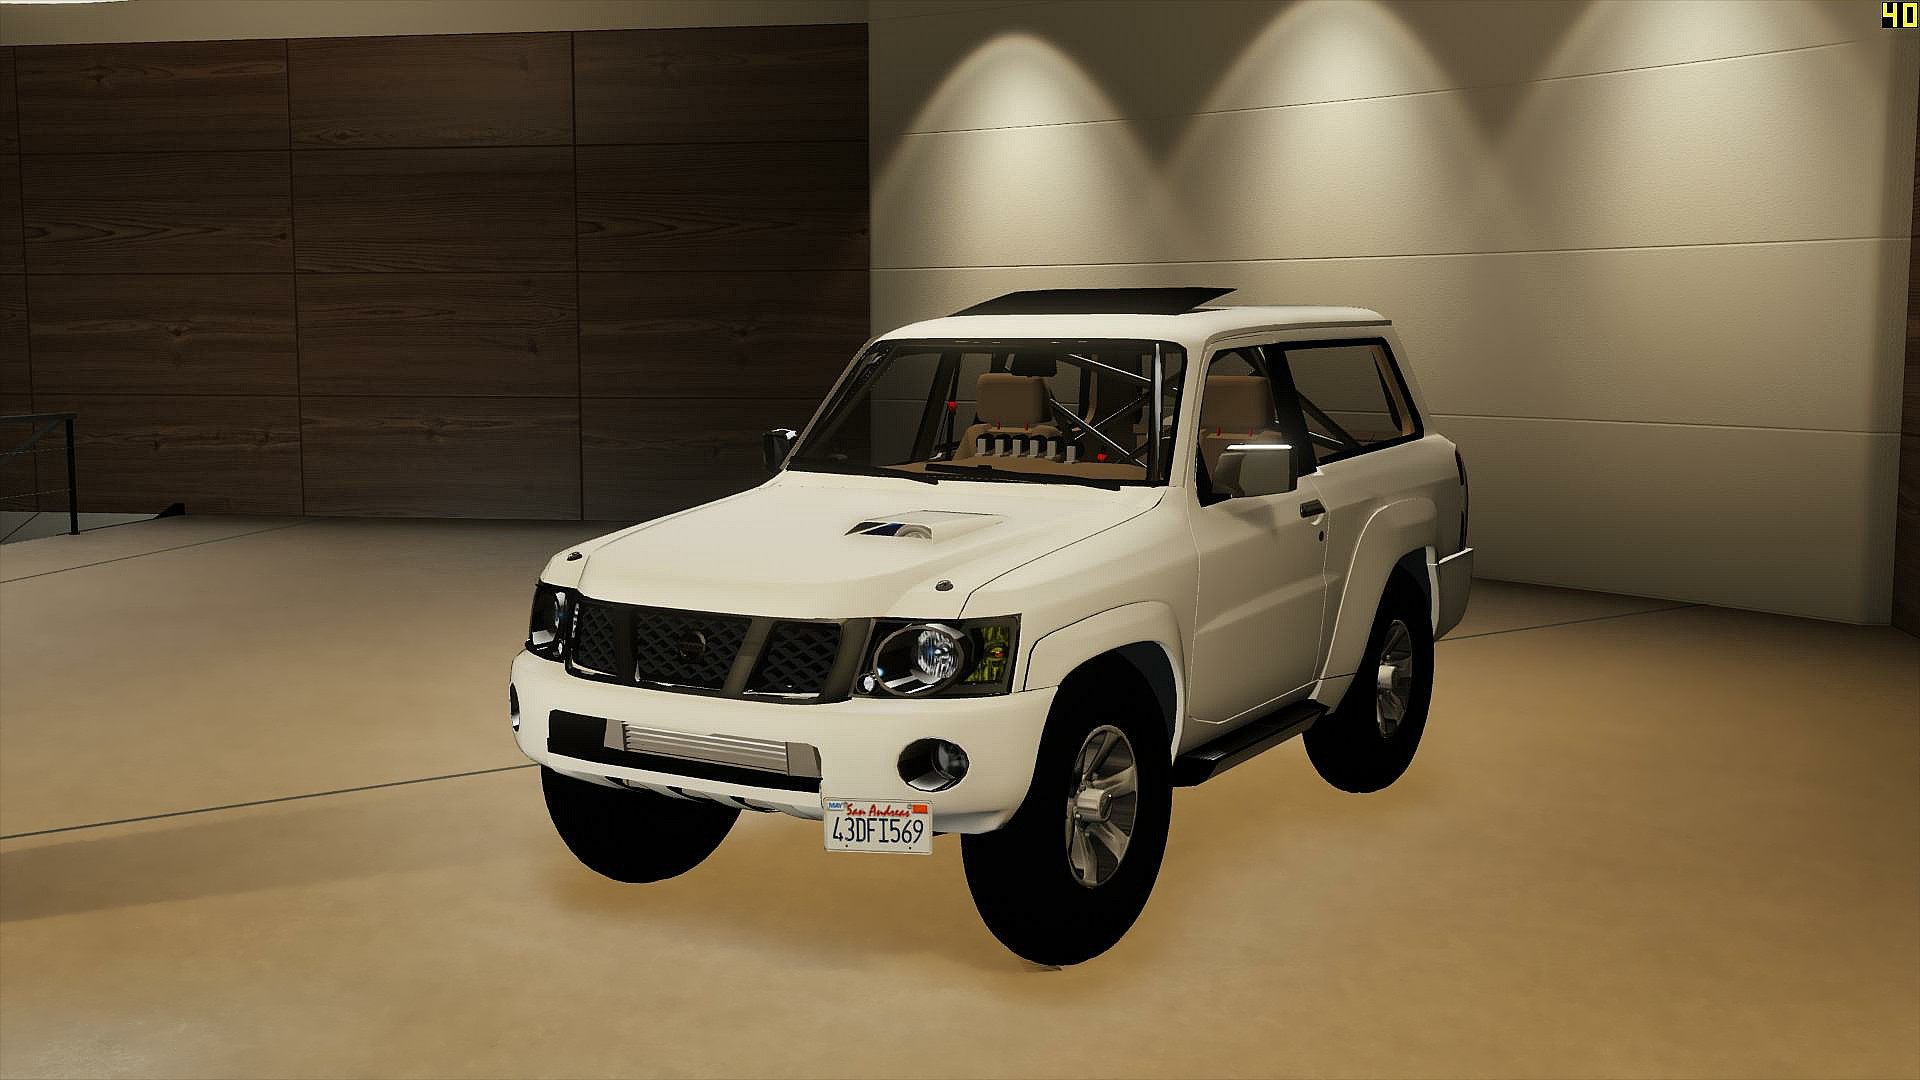 Nissan Patrol Safari Vtc 4800 Turbo Y61 2016 2 Door Add